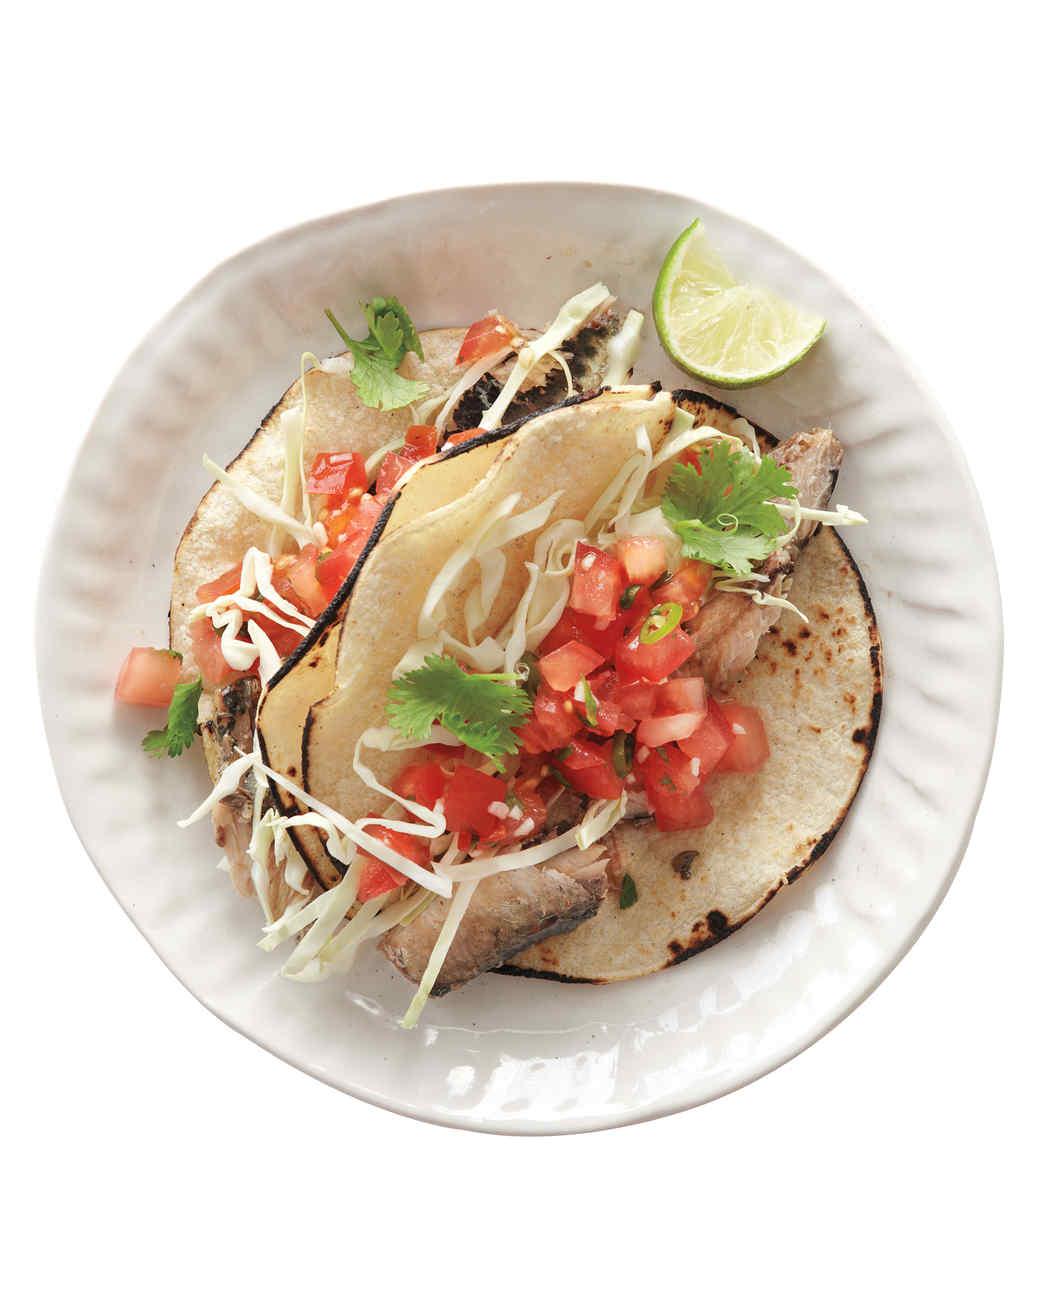 sardines-tacos-1011mbd107664.jpg